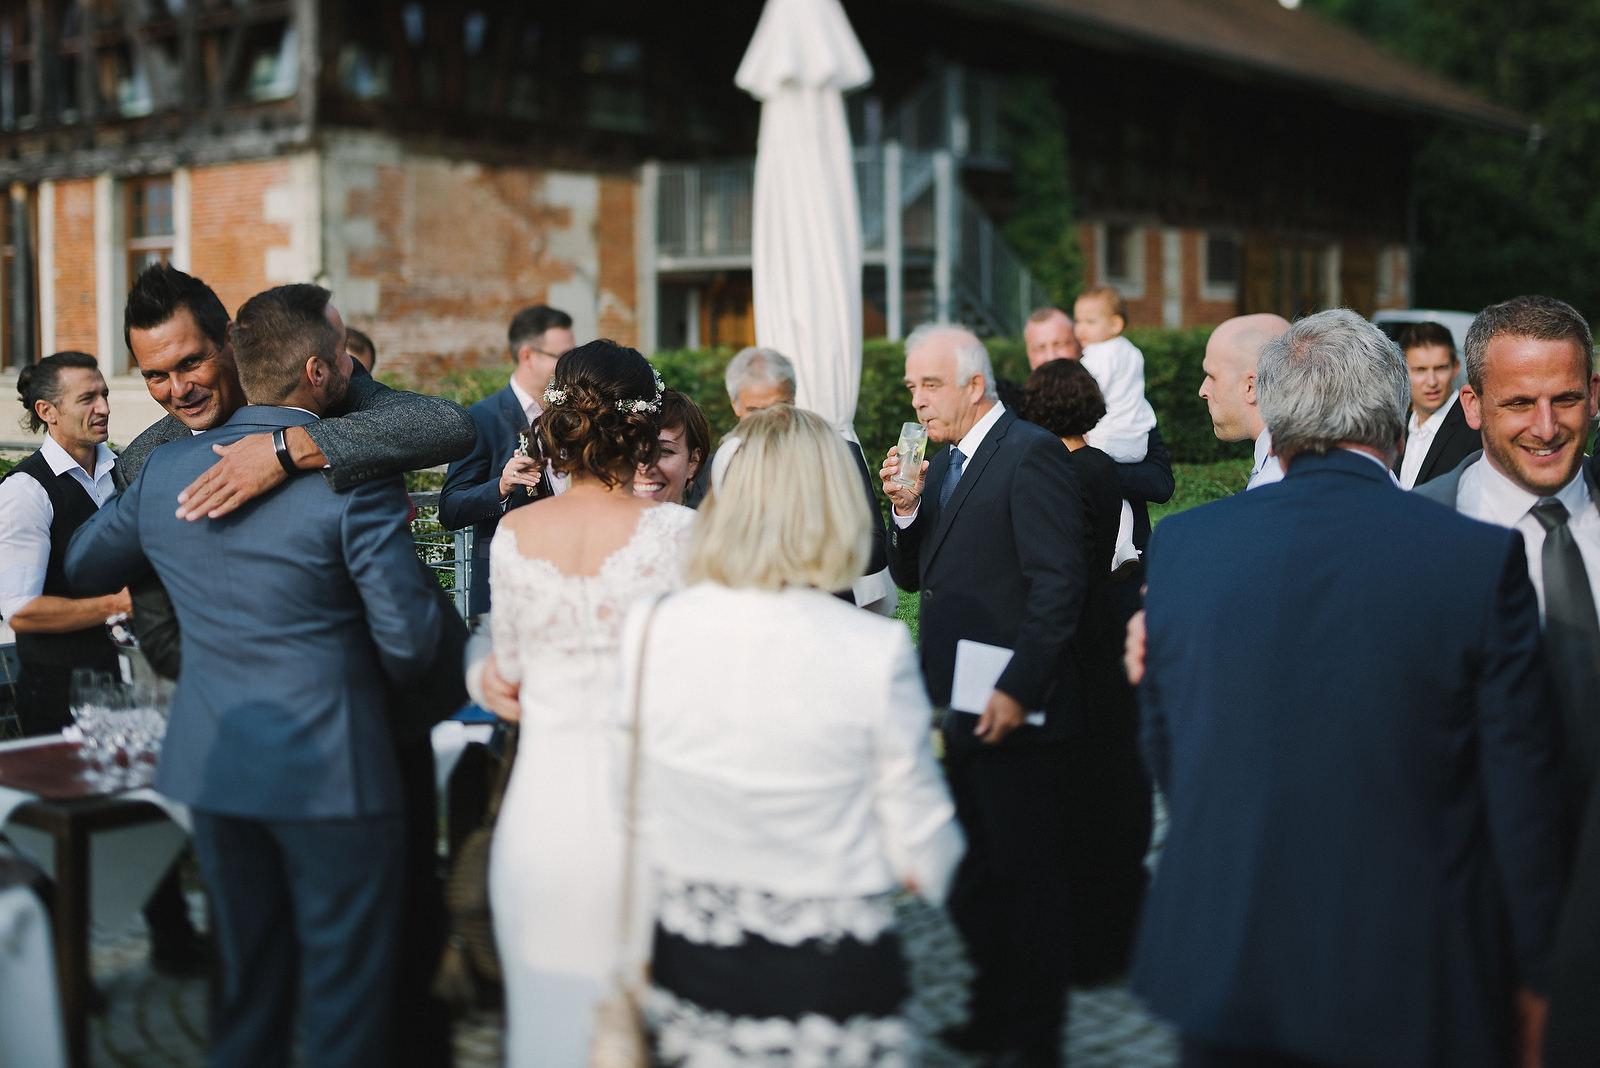 Fotograf Konstanz - Hochzeitsfotograf Reutlingen Achalm Hochzeit EFP 69 - Als Hochzeitsfotograf auf der Achalm, Reutlingen  - 54 -